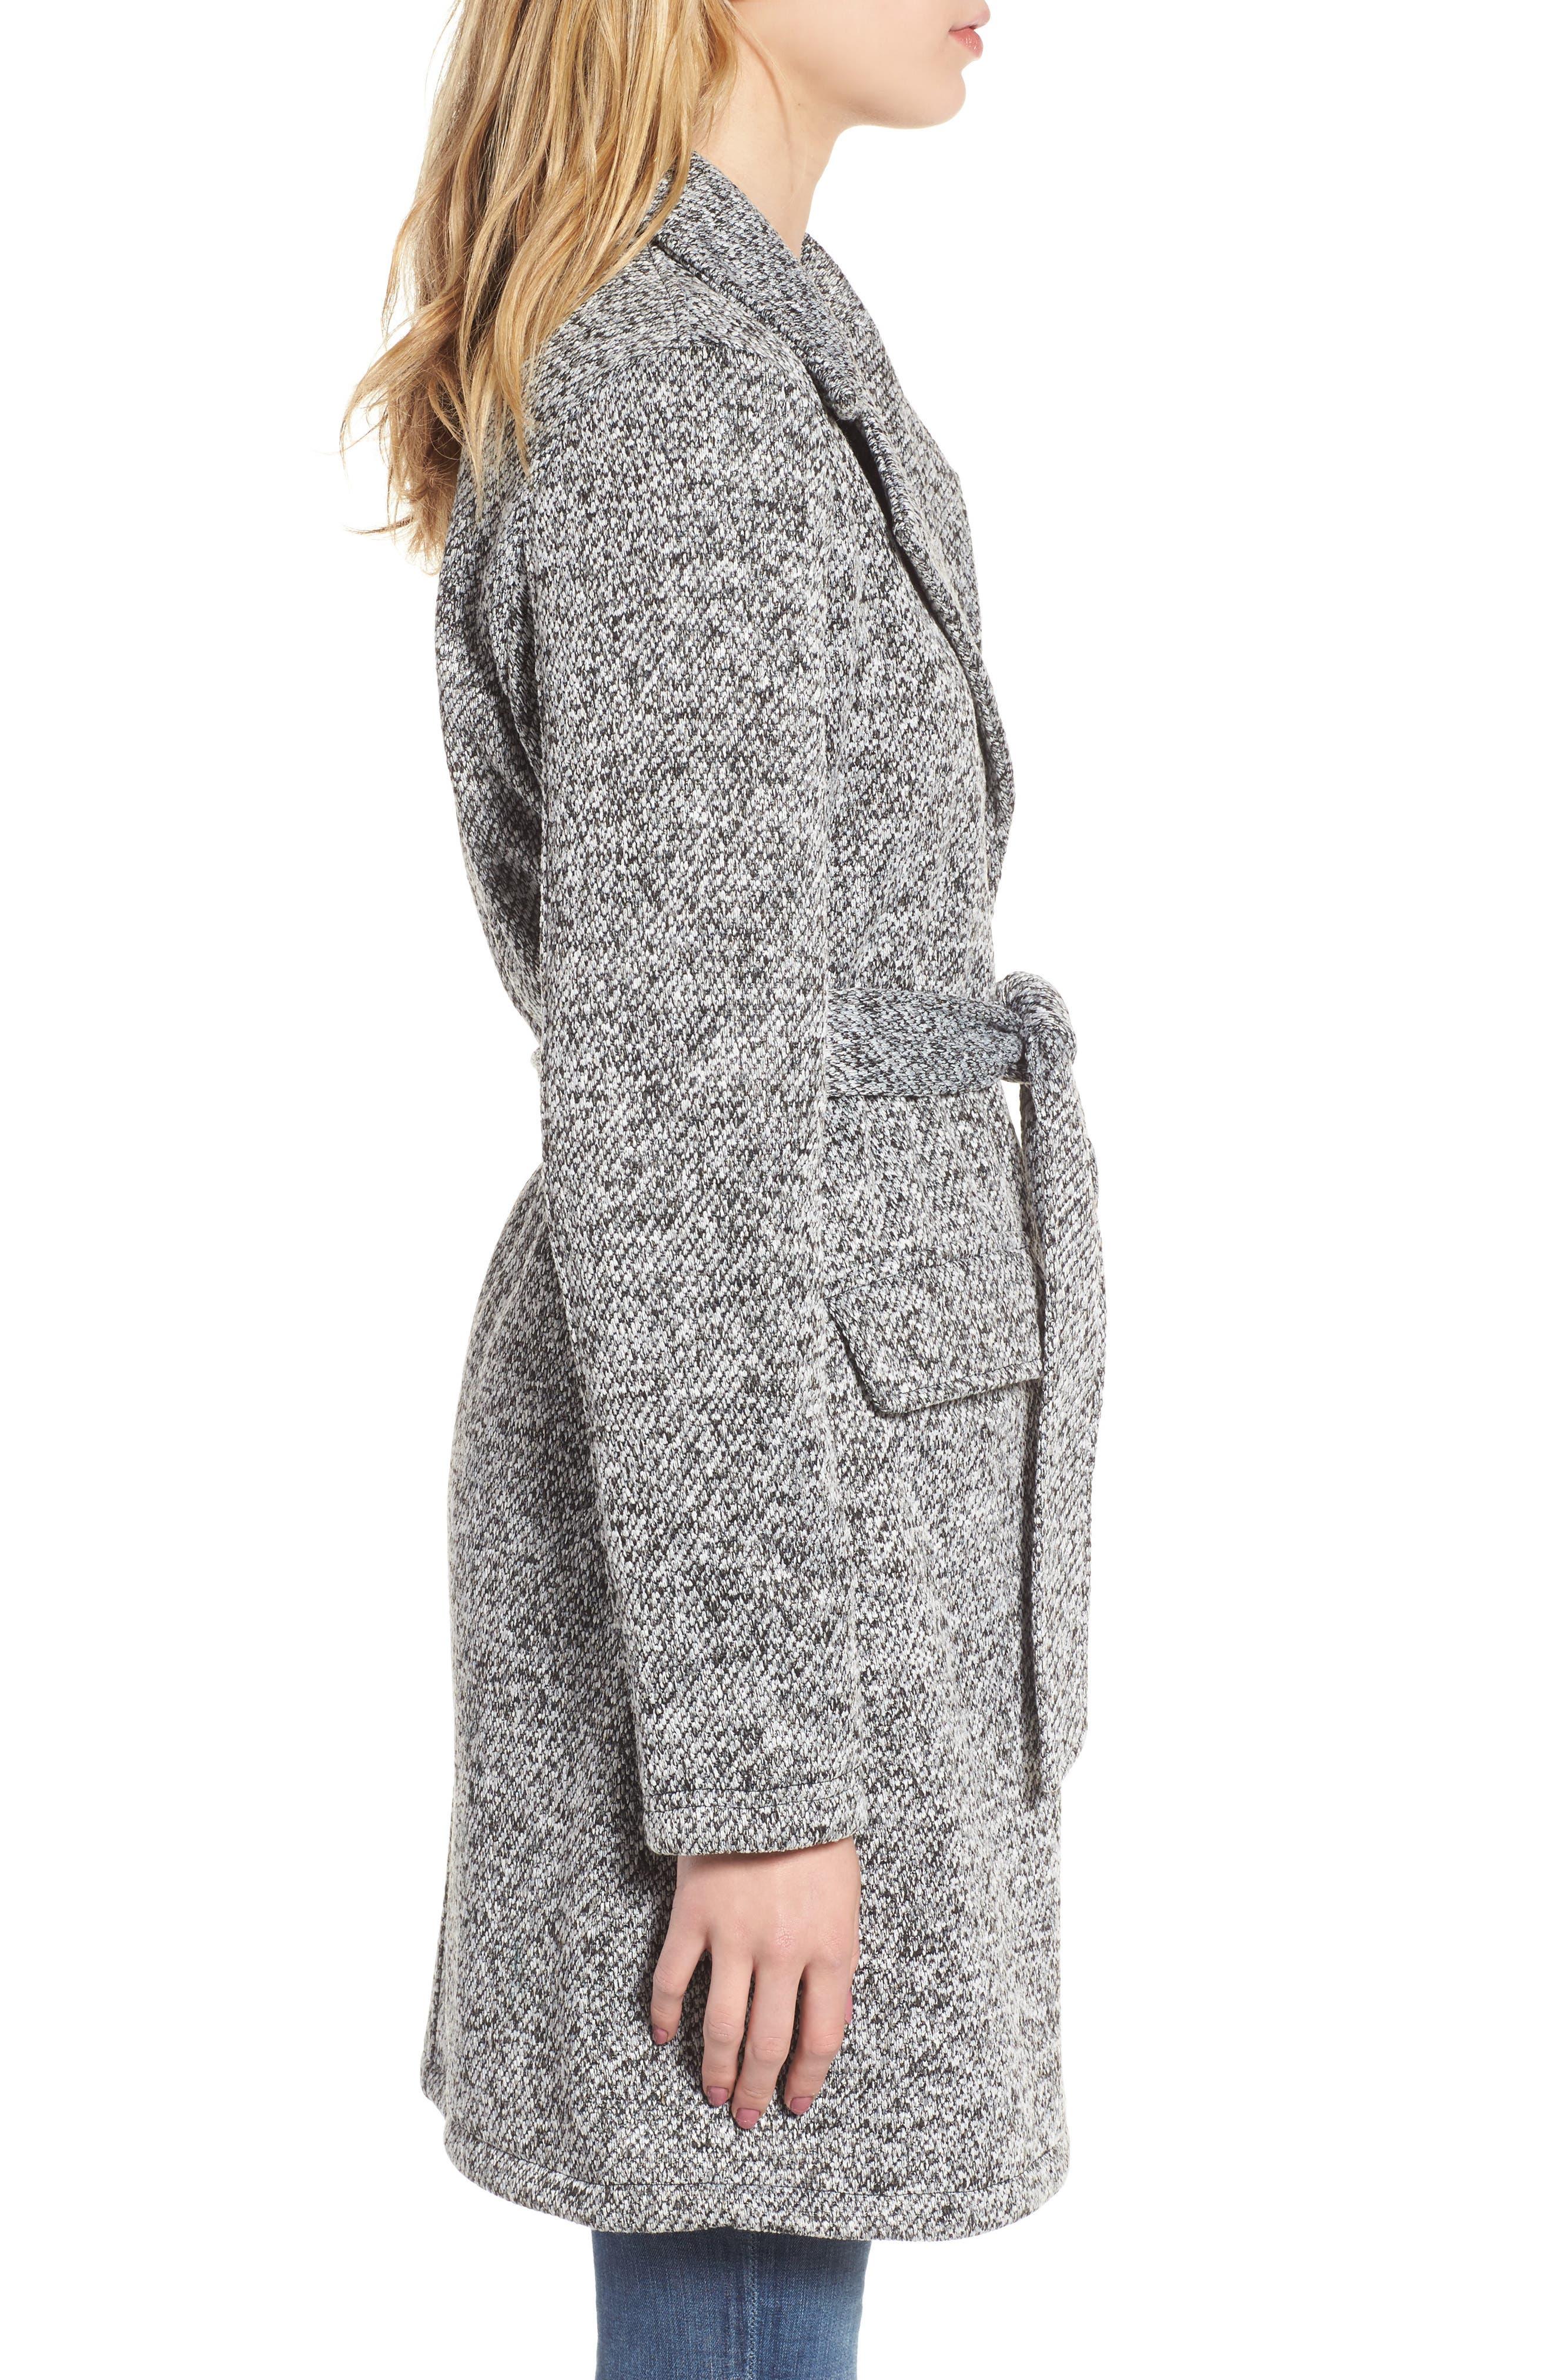 Belted Fleece Jacket,                             Alternate thumbnail 3, color,                             Light Grey Heather